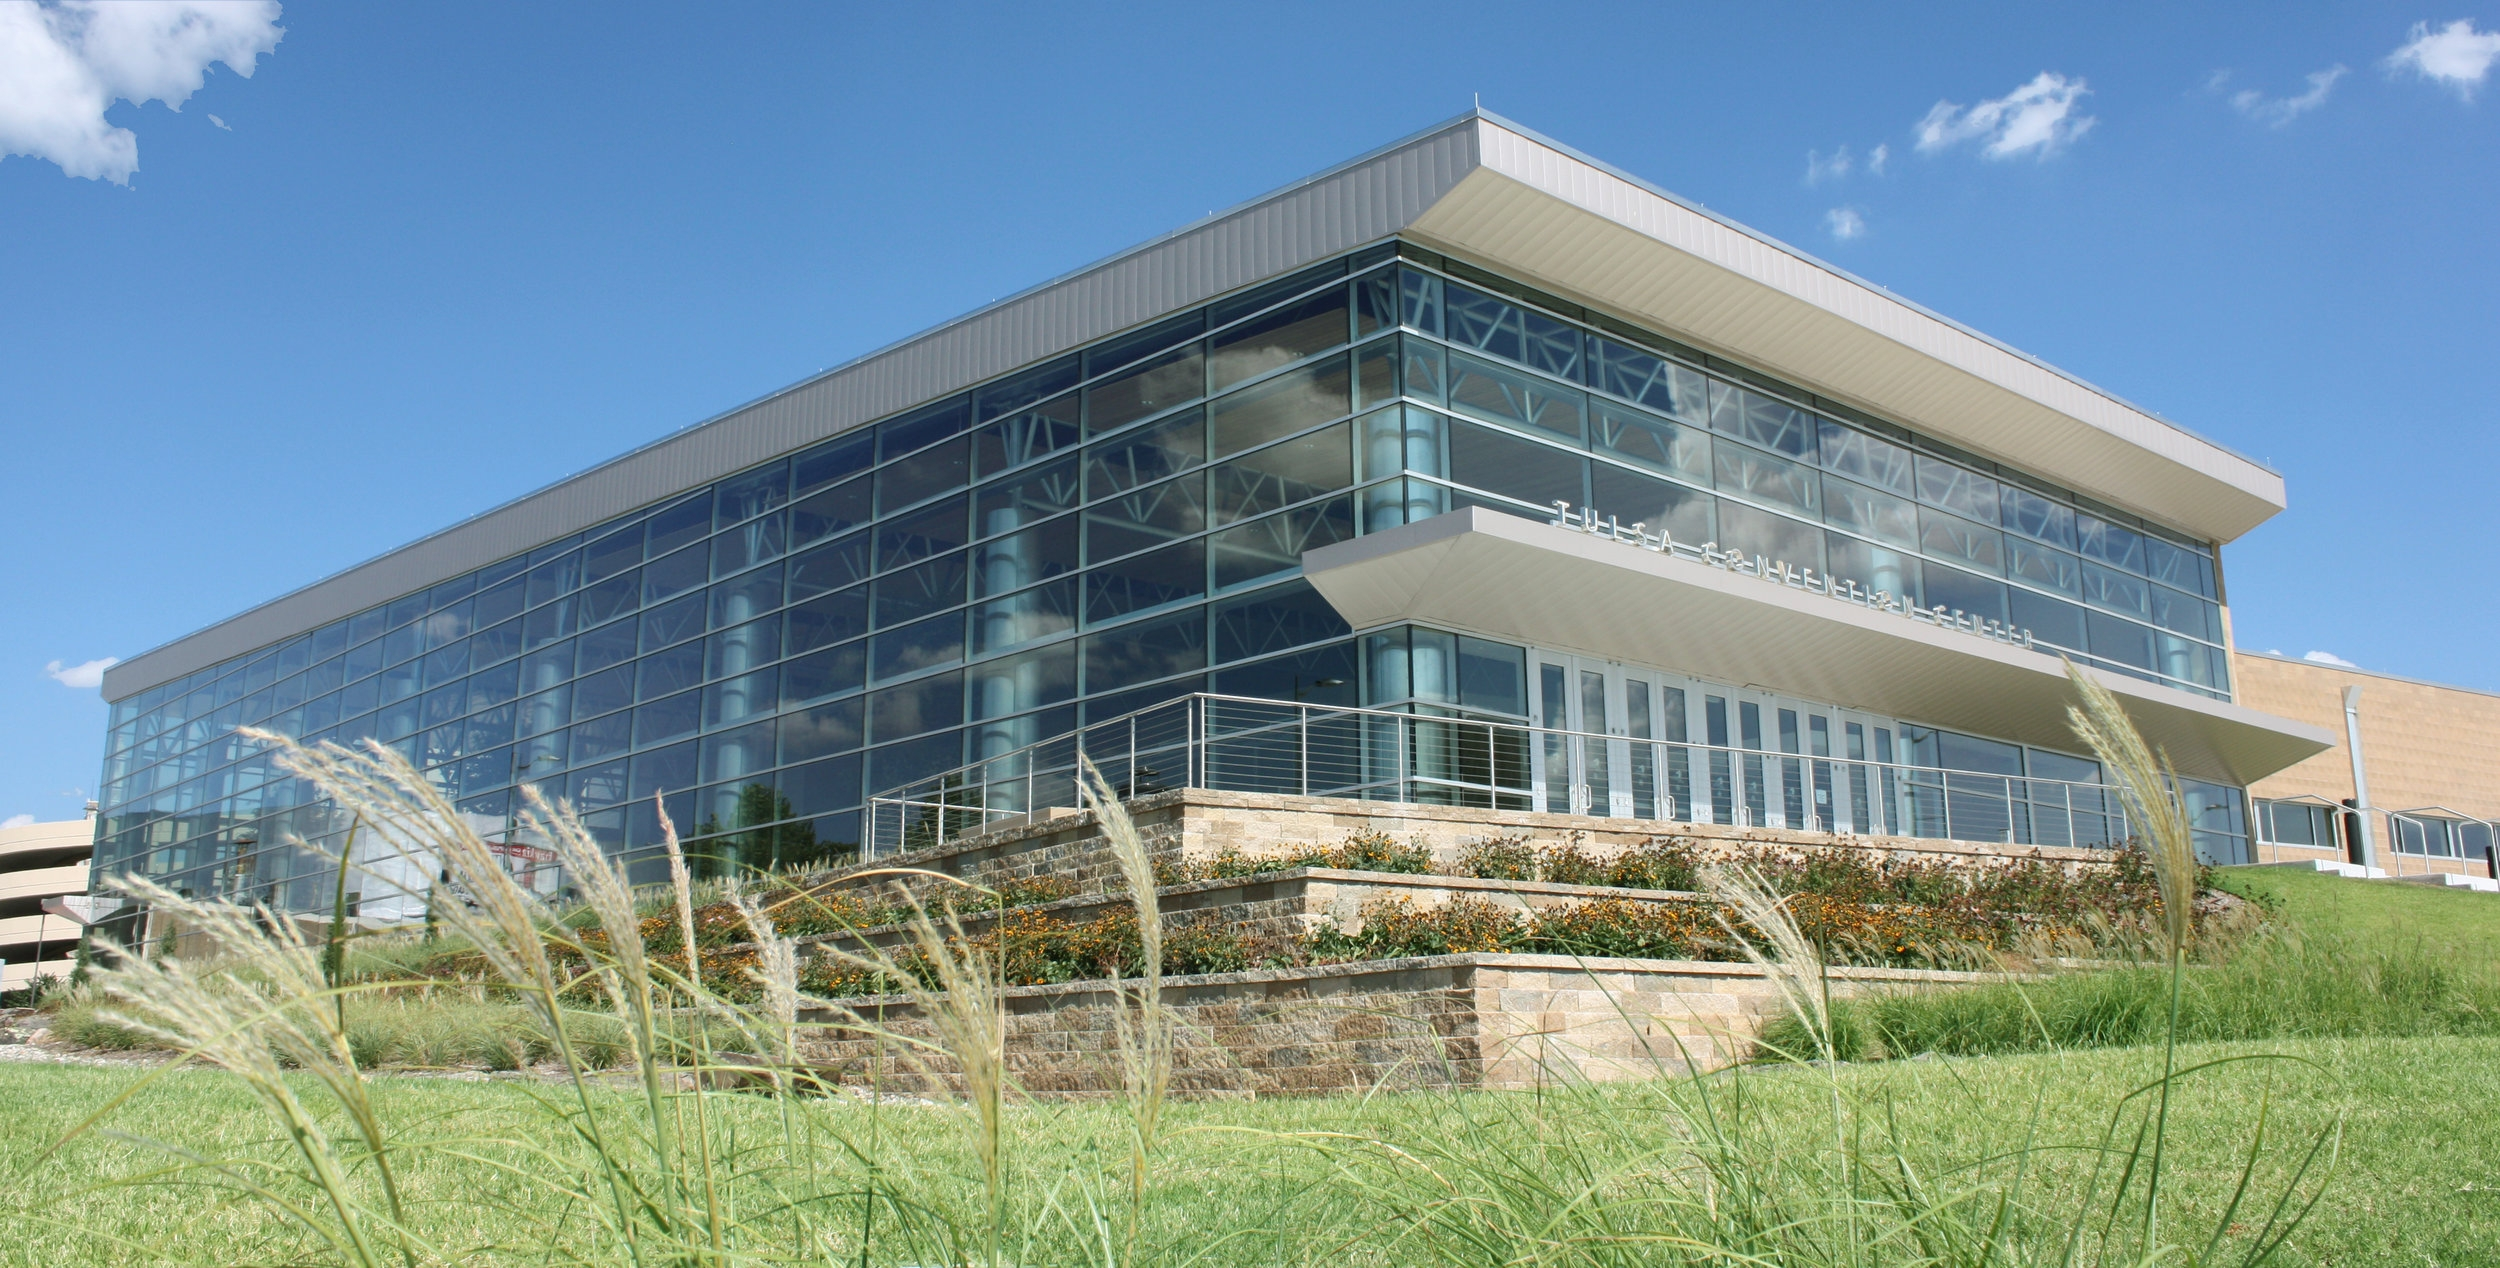 Community: Cox Business Center expansion & renovation